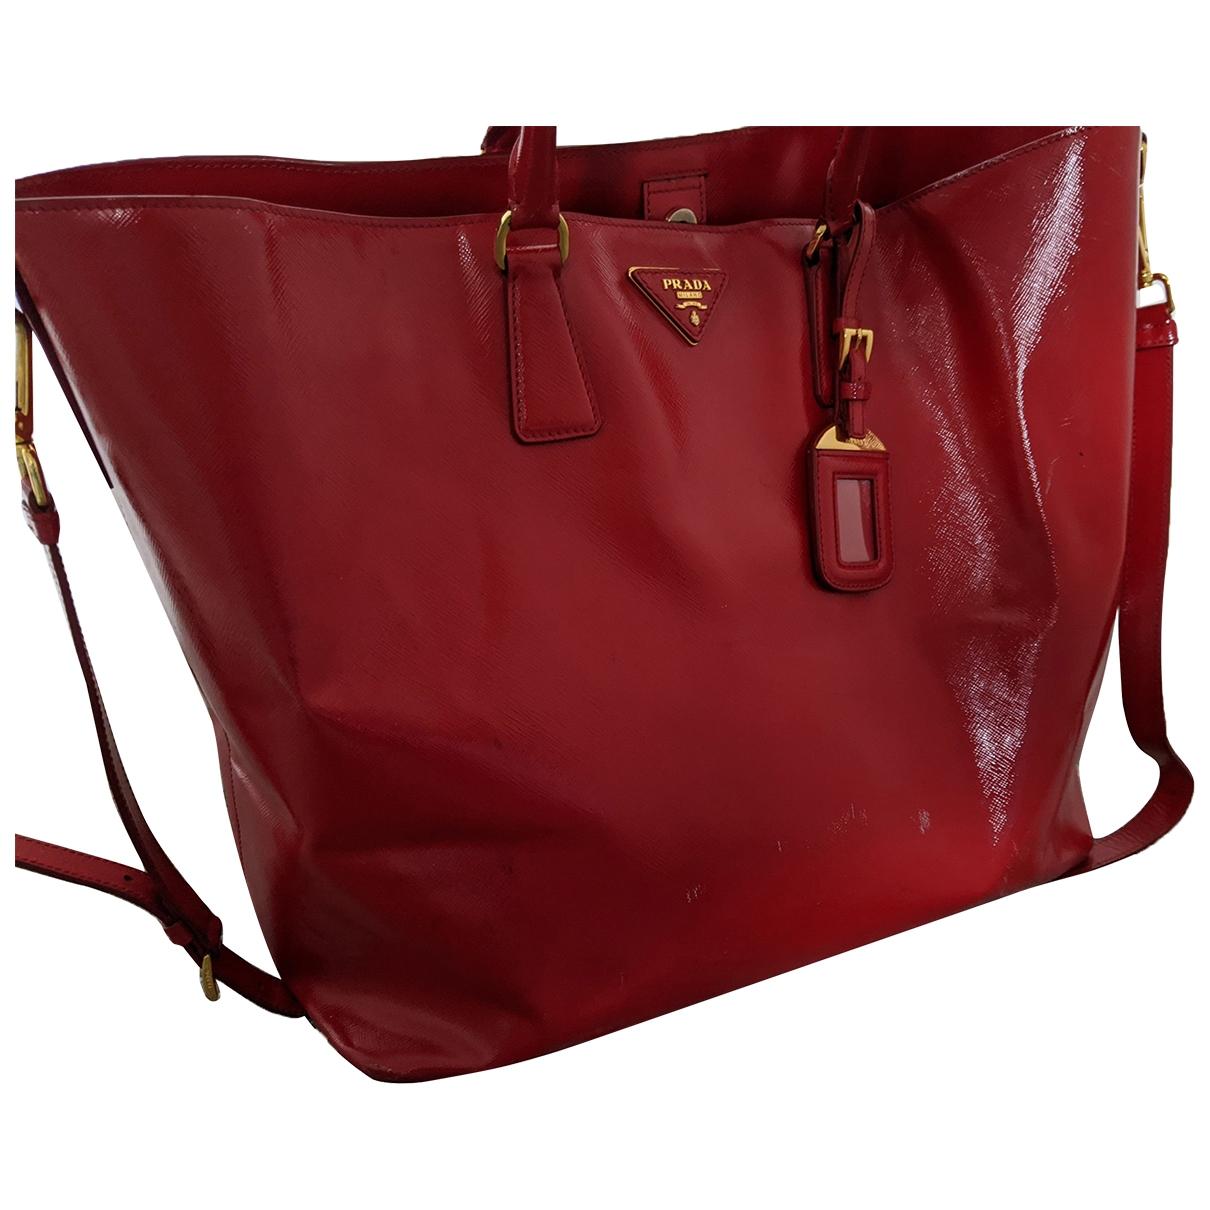 Prada \N Red Patent leather handbag for Women \N